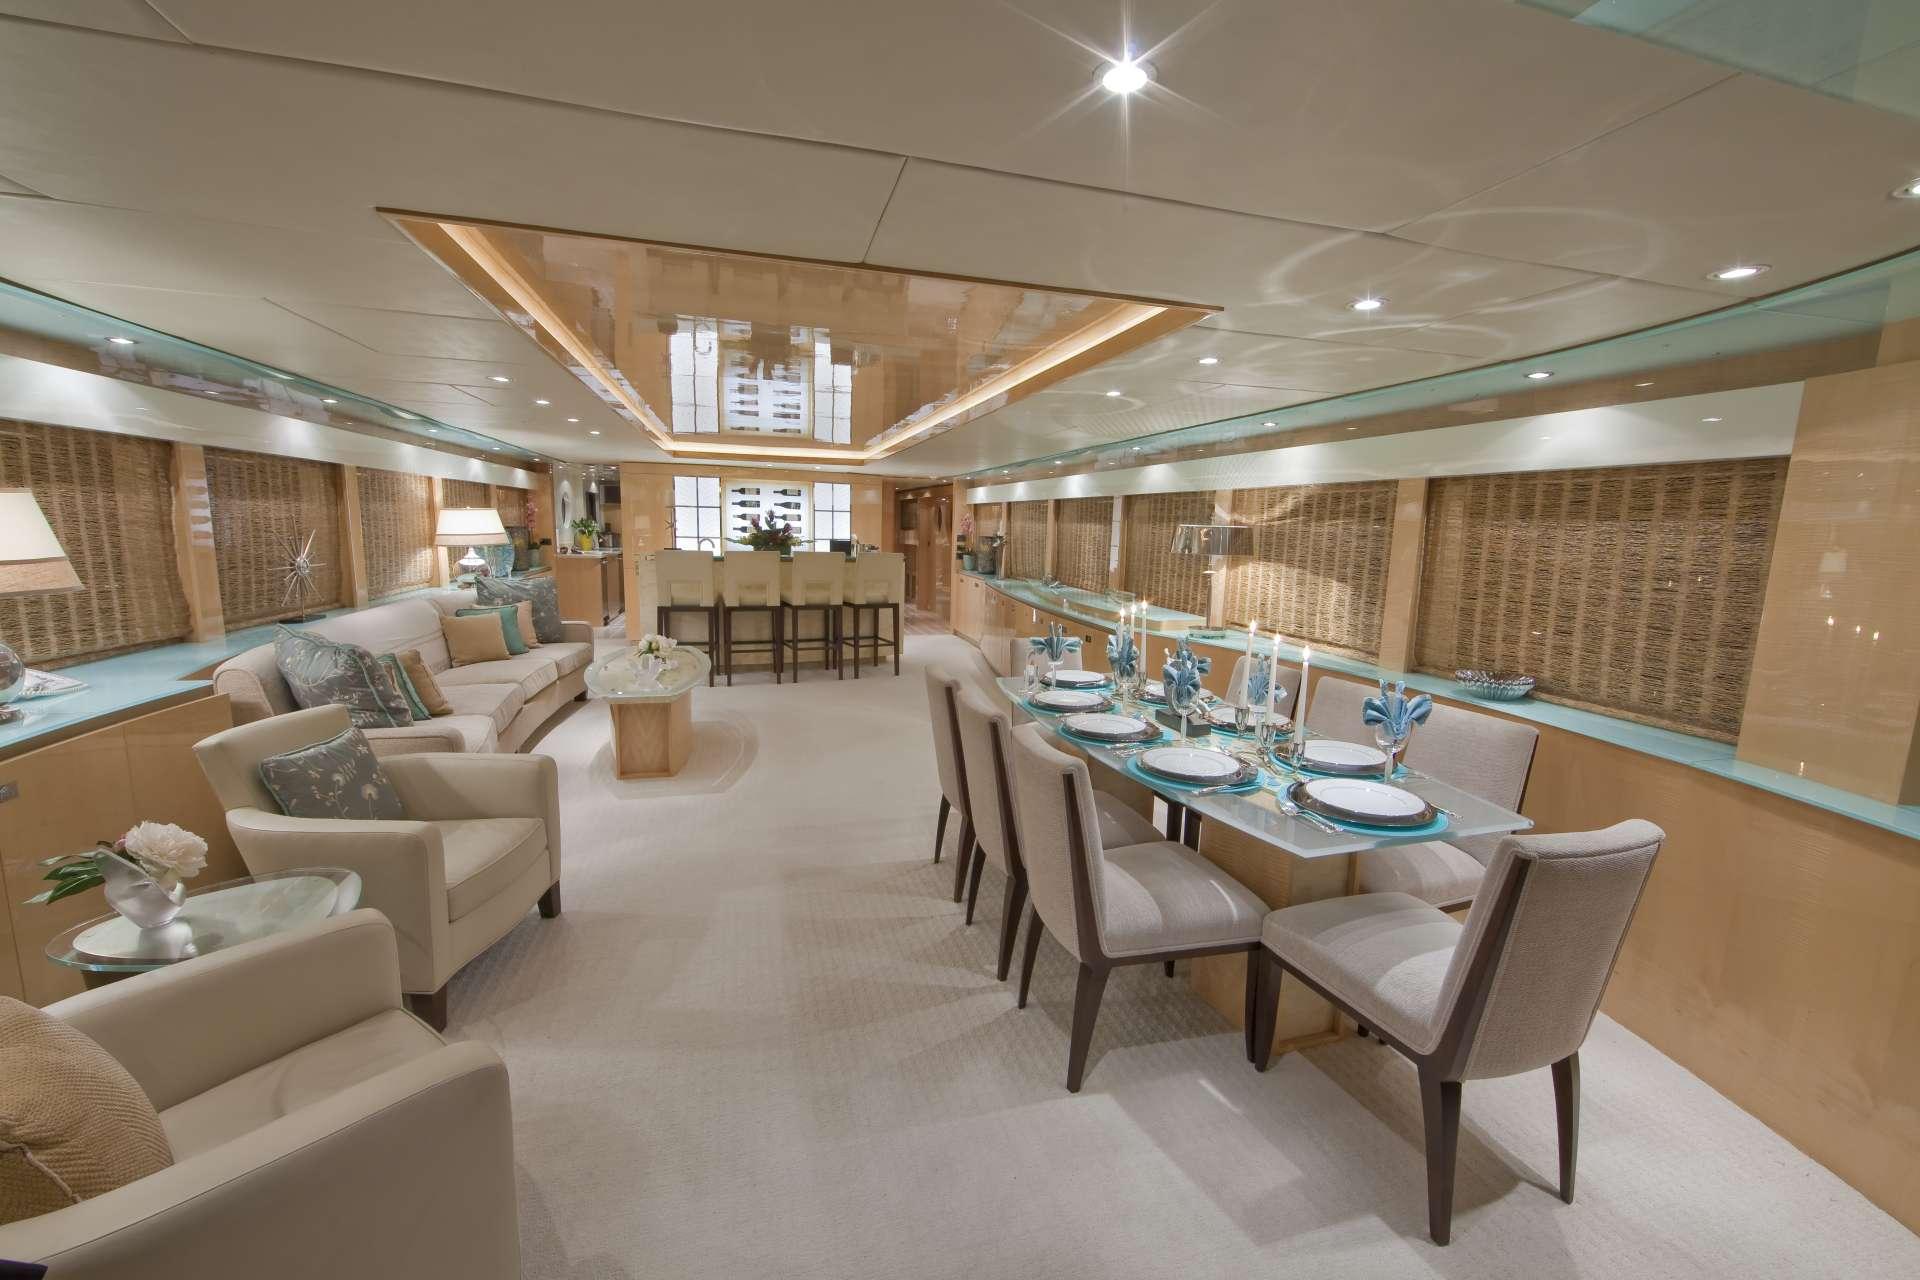 Power Yacht 'Power', 8 PAX, 4 Crew, 103.00 Ft, 31.00 Meters, Built 2008, Johnson, Refit Year